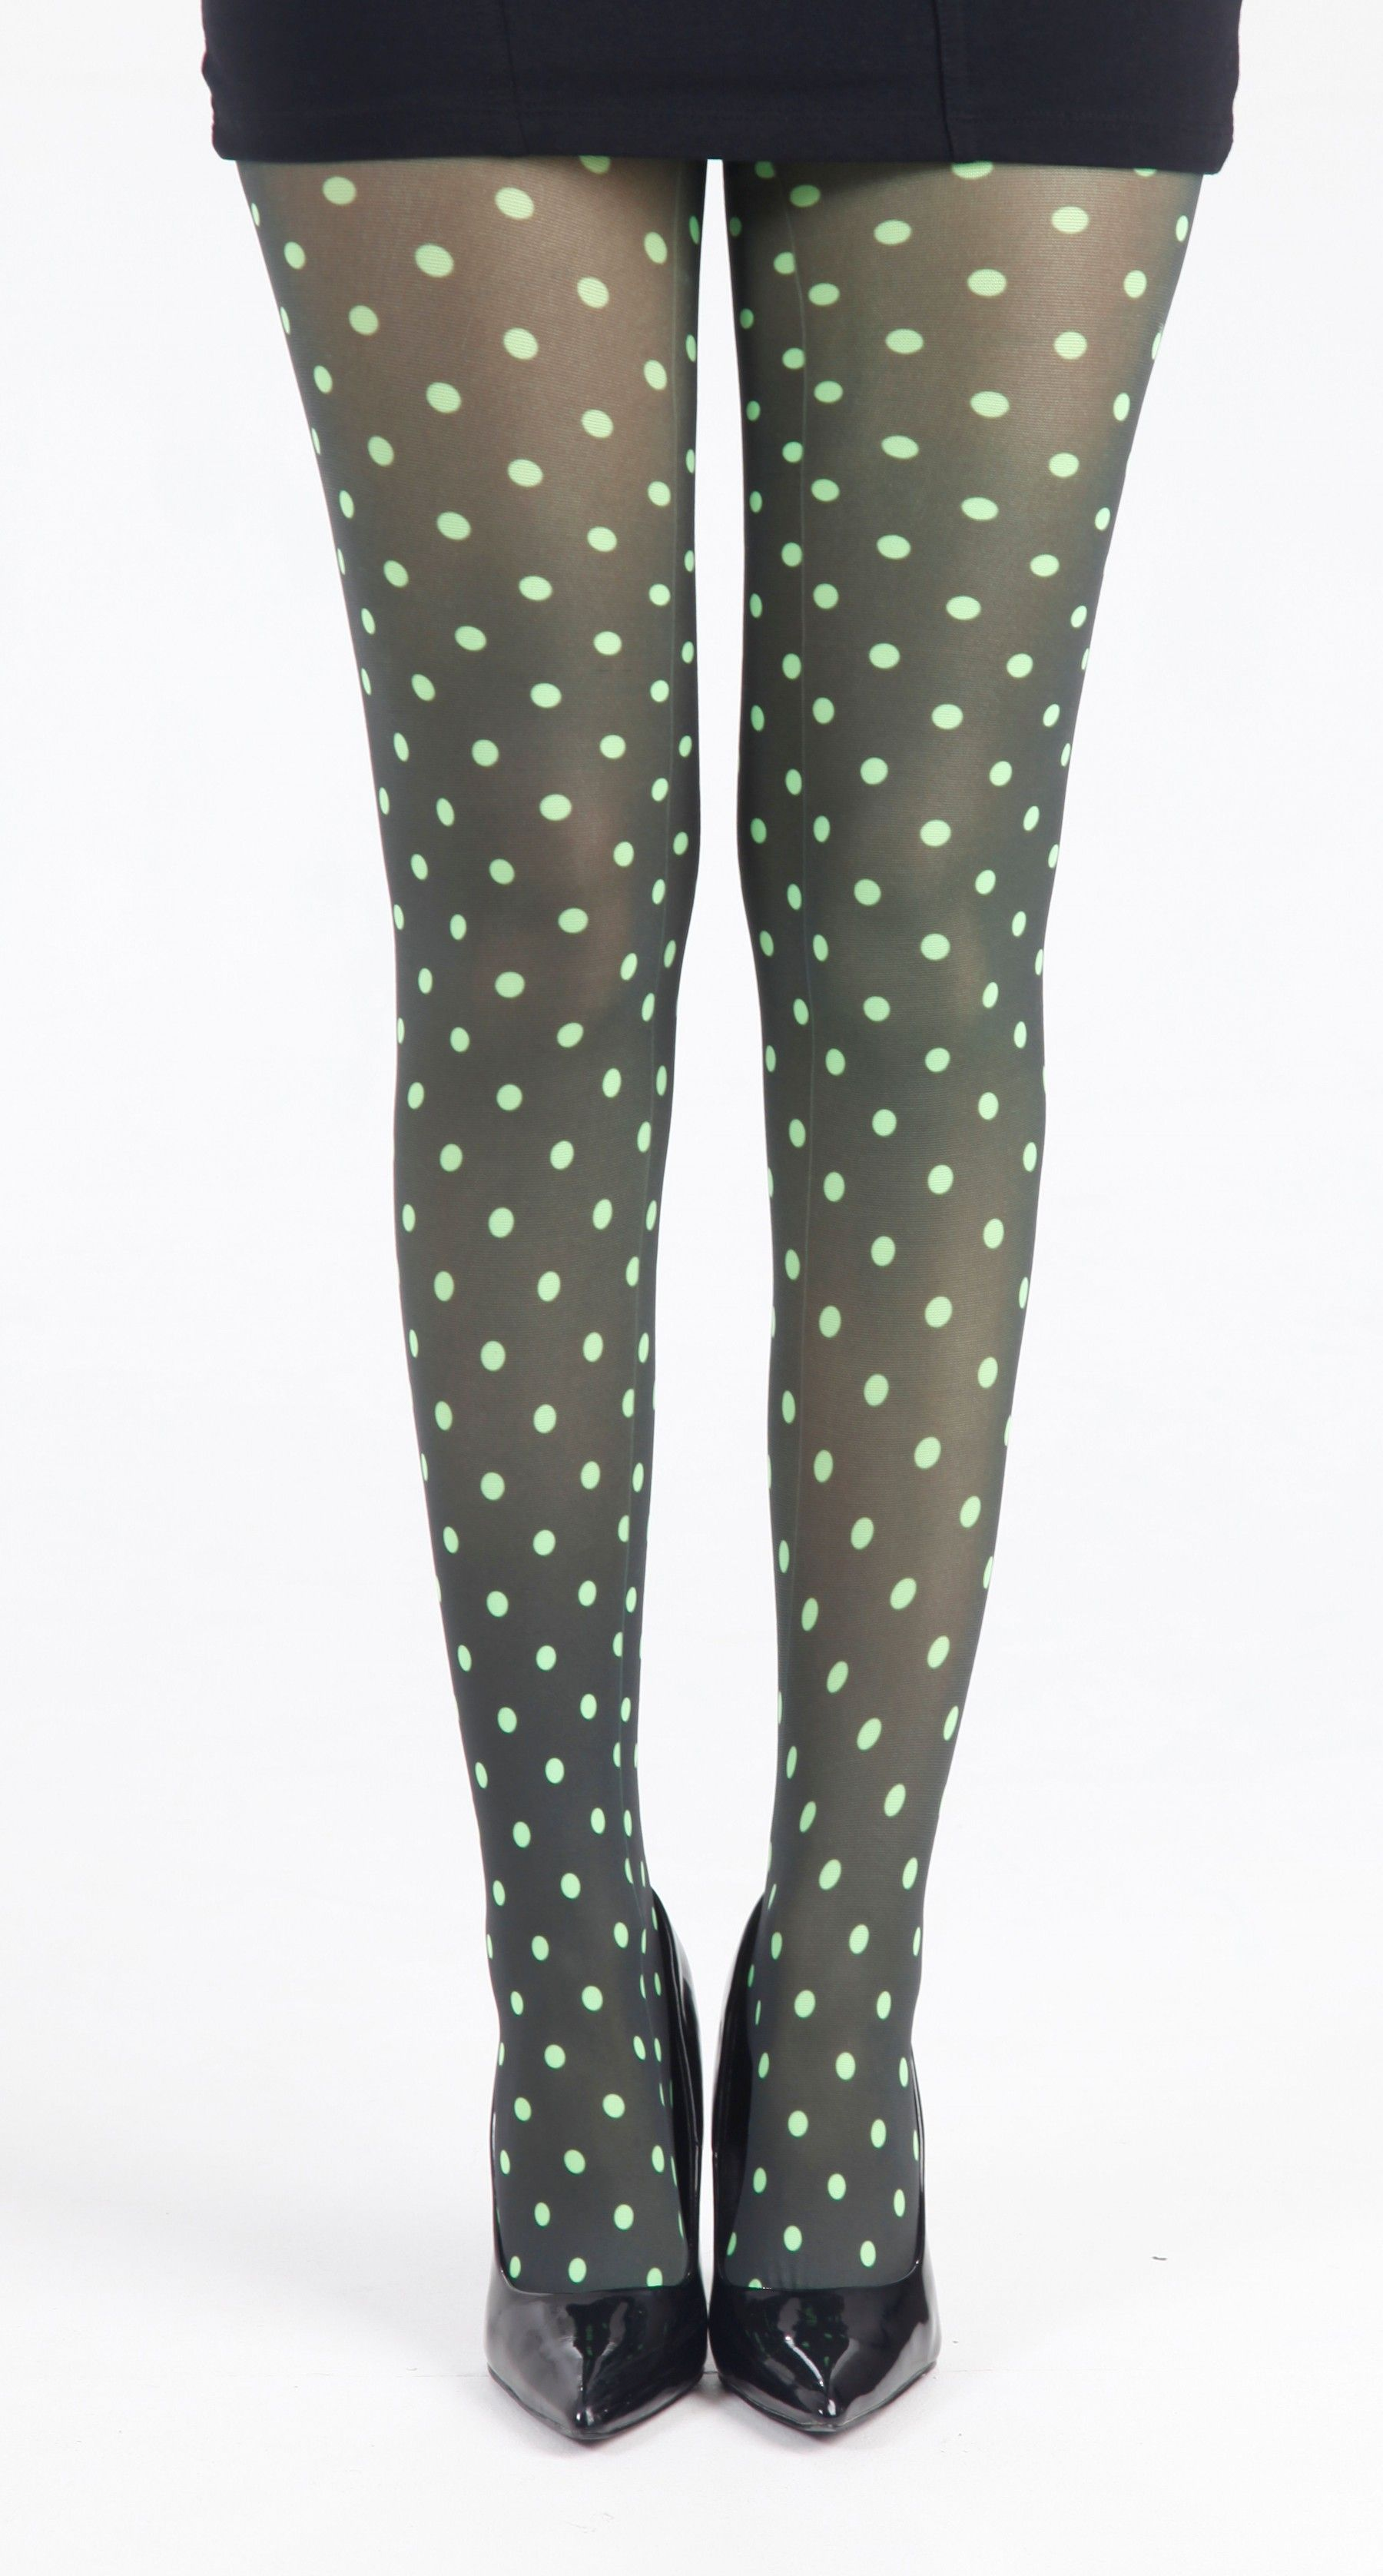 Polka Dot B Printed Tights (Flo Green) - Pamela Mann - Shop these tights at @fashion_tights_styles www.fashion-tights.net #tights #pantyhose #hosiery #nylons #tightslegs #tightsfeet #tightslover #tightsblogger #tightsfashion #pantyhoselegs #pantyhosefeet #pantyhoselover #pantyhoseblogger #pantyhosefashion #nylonlegs #nylonfeet #nylonlover #nylonblogger #nylonfashion #hosierylover #hosierylegs #hosieryfeet #hosieryblogger #hosieryfashion #legs